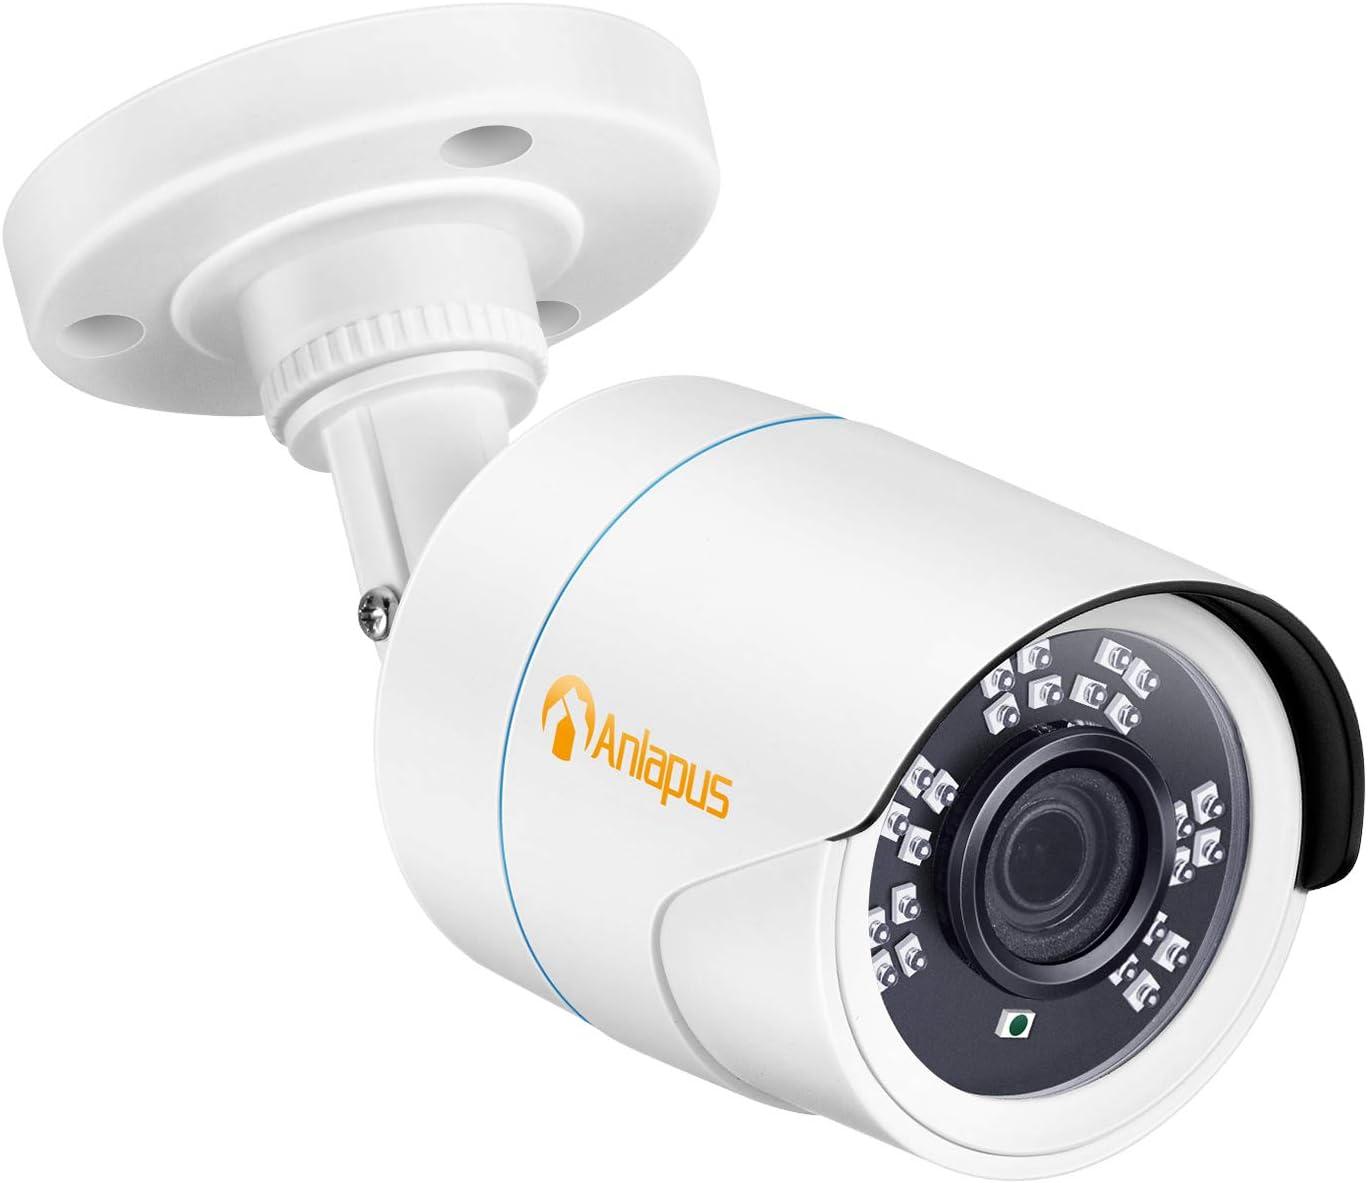 Anlapus 1080P HD 2MP 4-in-1 CVI/TVI/AHD/960H Analog CVBS Hybrid Bullet Security Camera 24 IR LEDs Day Night Indoor Outdoor CCTV Camera for Home Surveillance DVR System